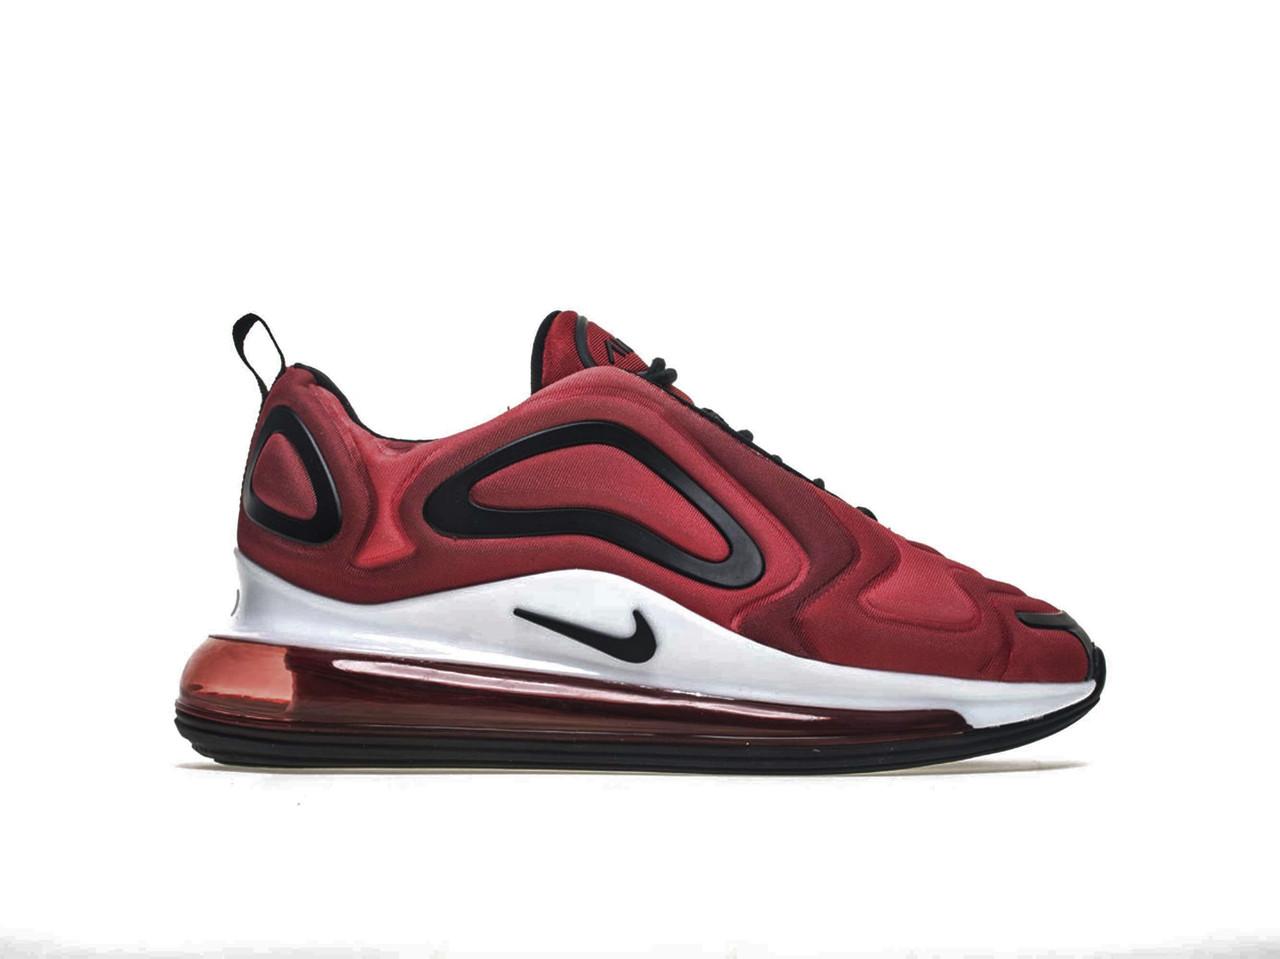 5c5098c2 Кроссовки Nike Air Max 720